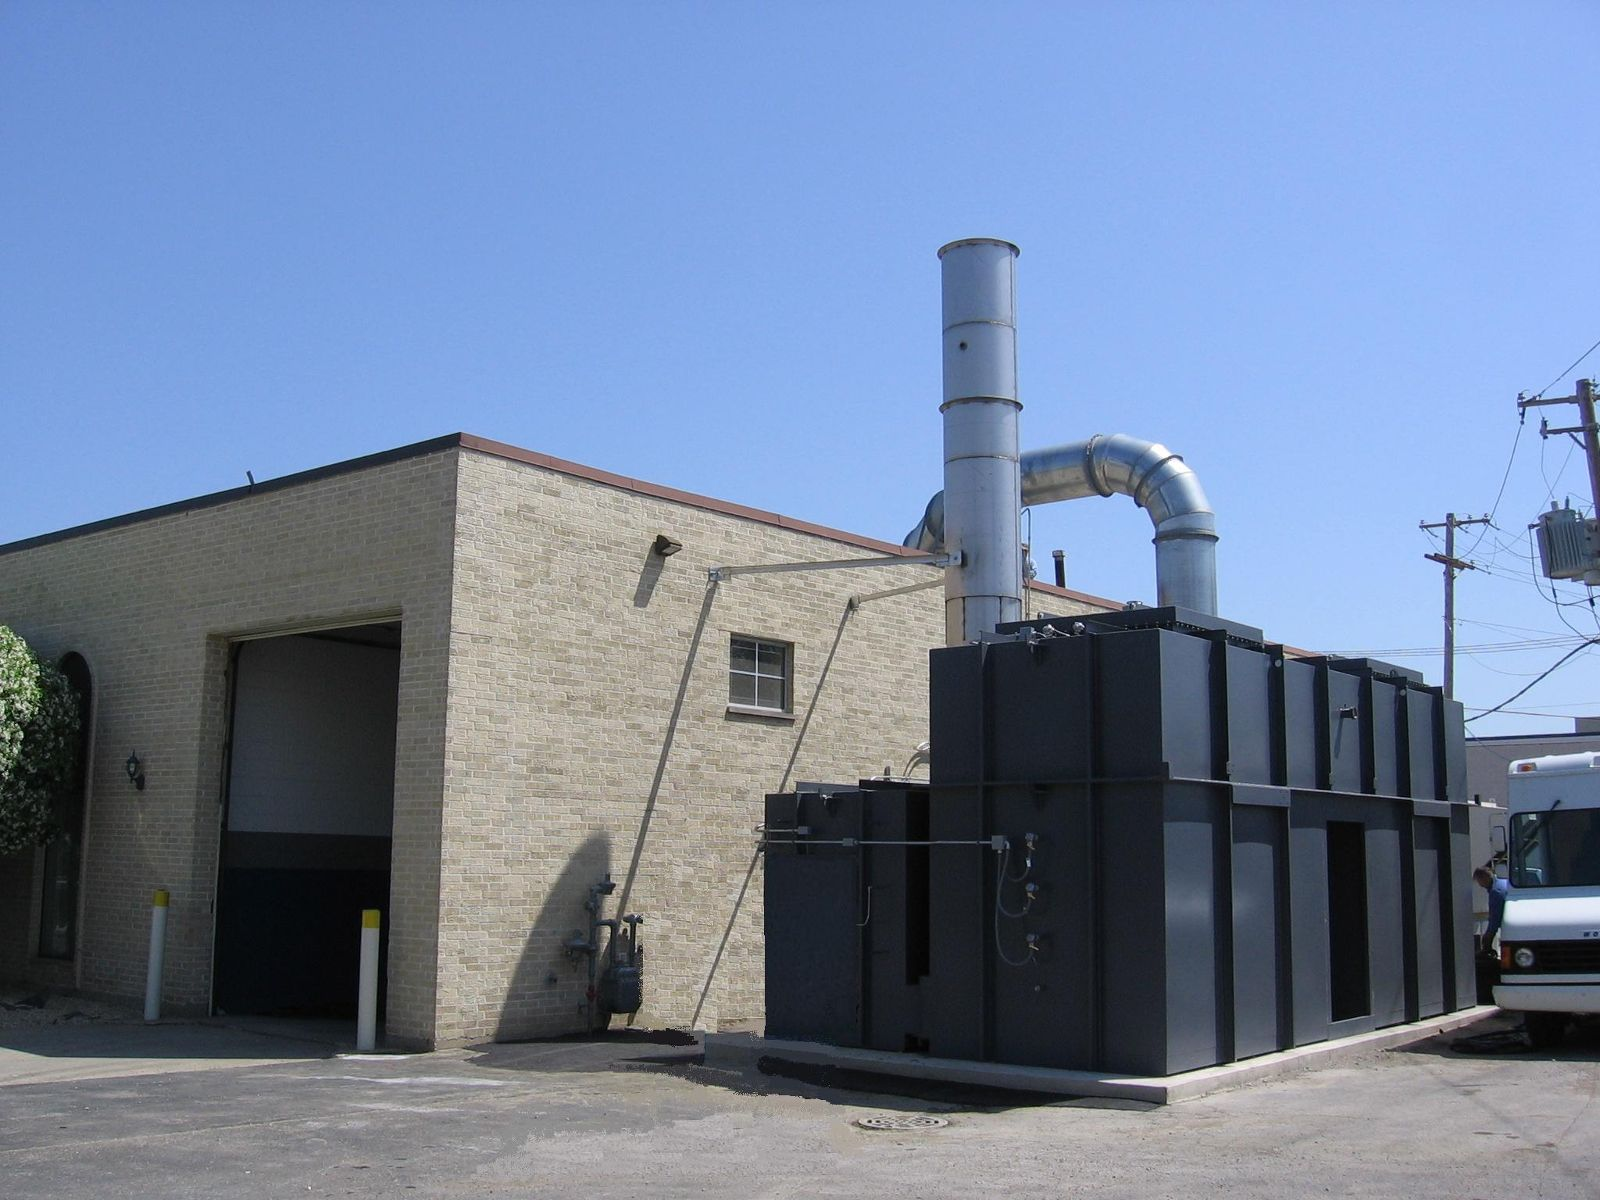 Heat/Web Offset Printer Installs Regenerative Thermal Oxidizer (RTO) for VOC Control